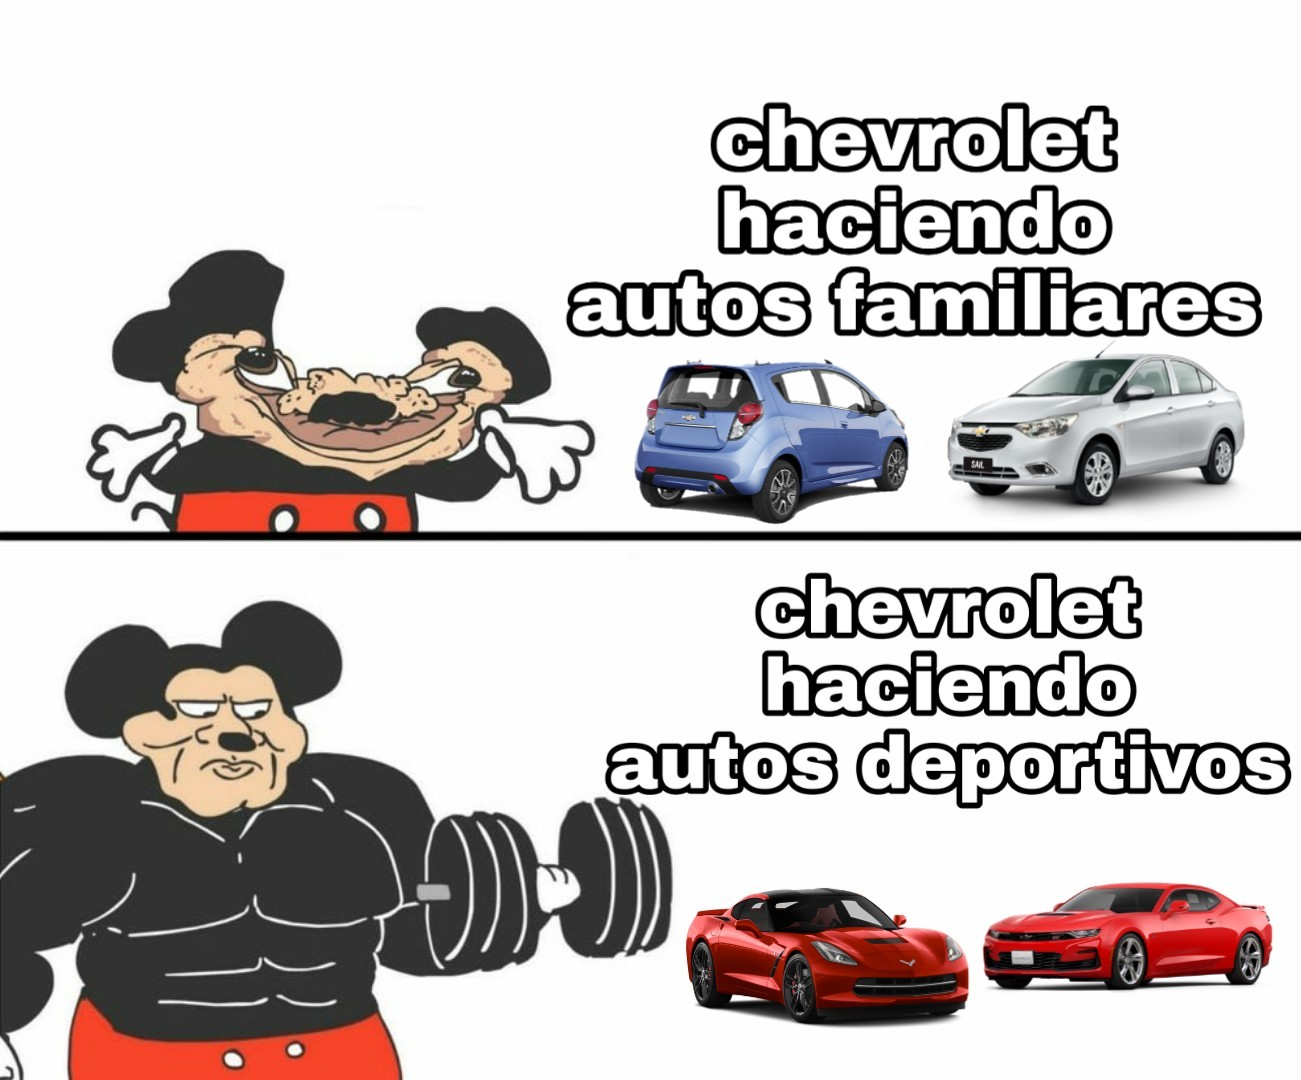 spark chikito - meme